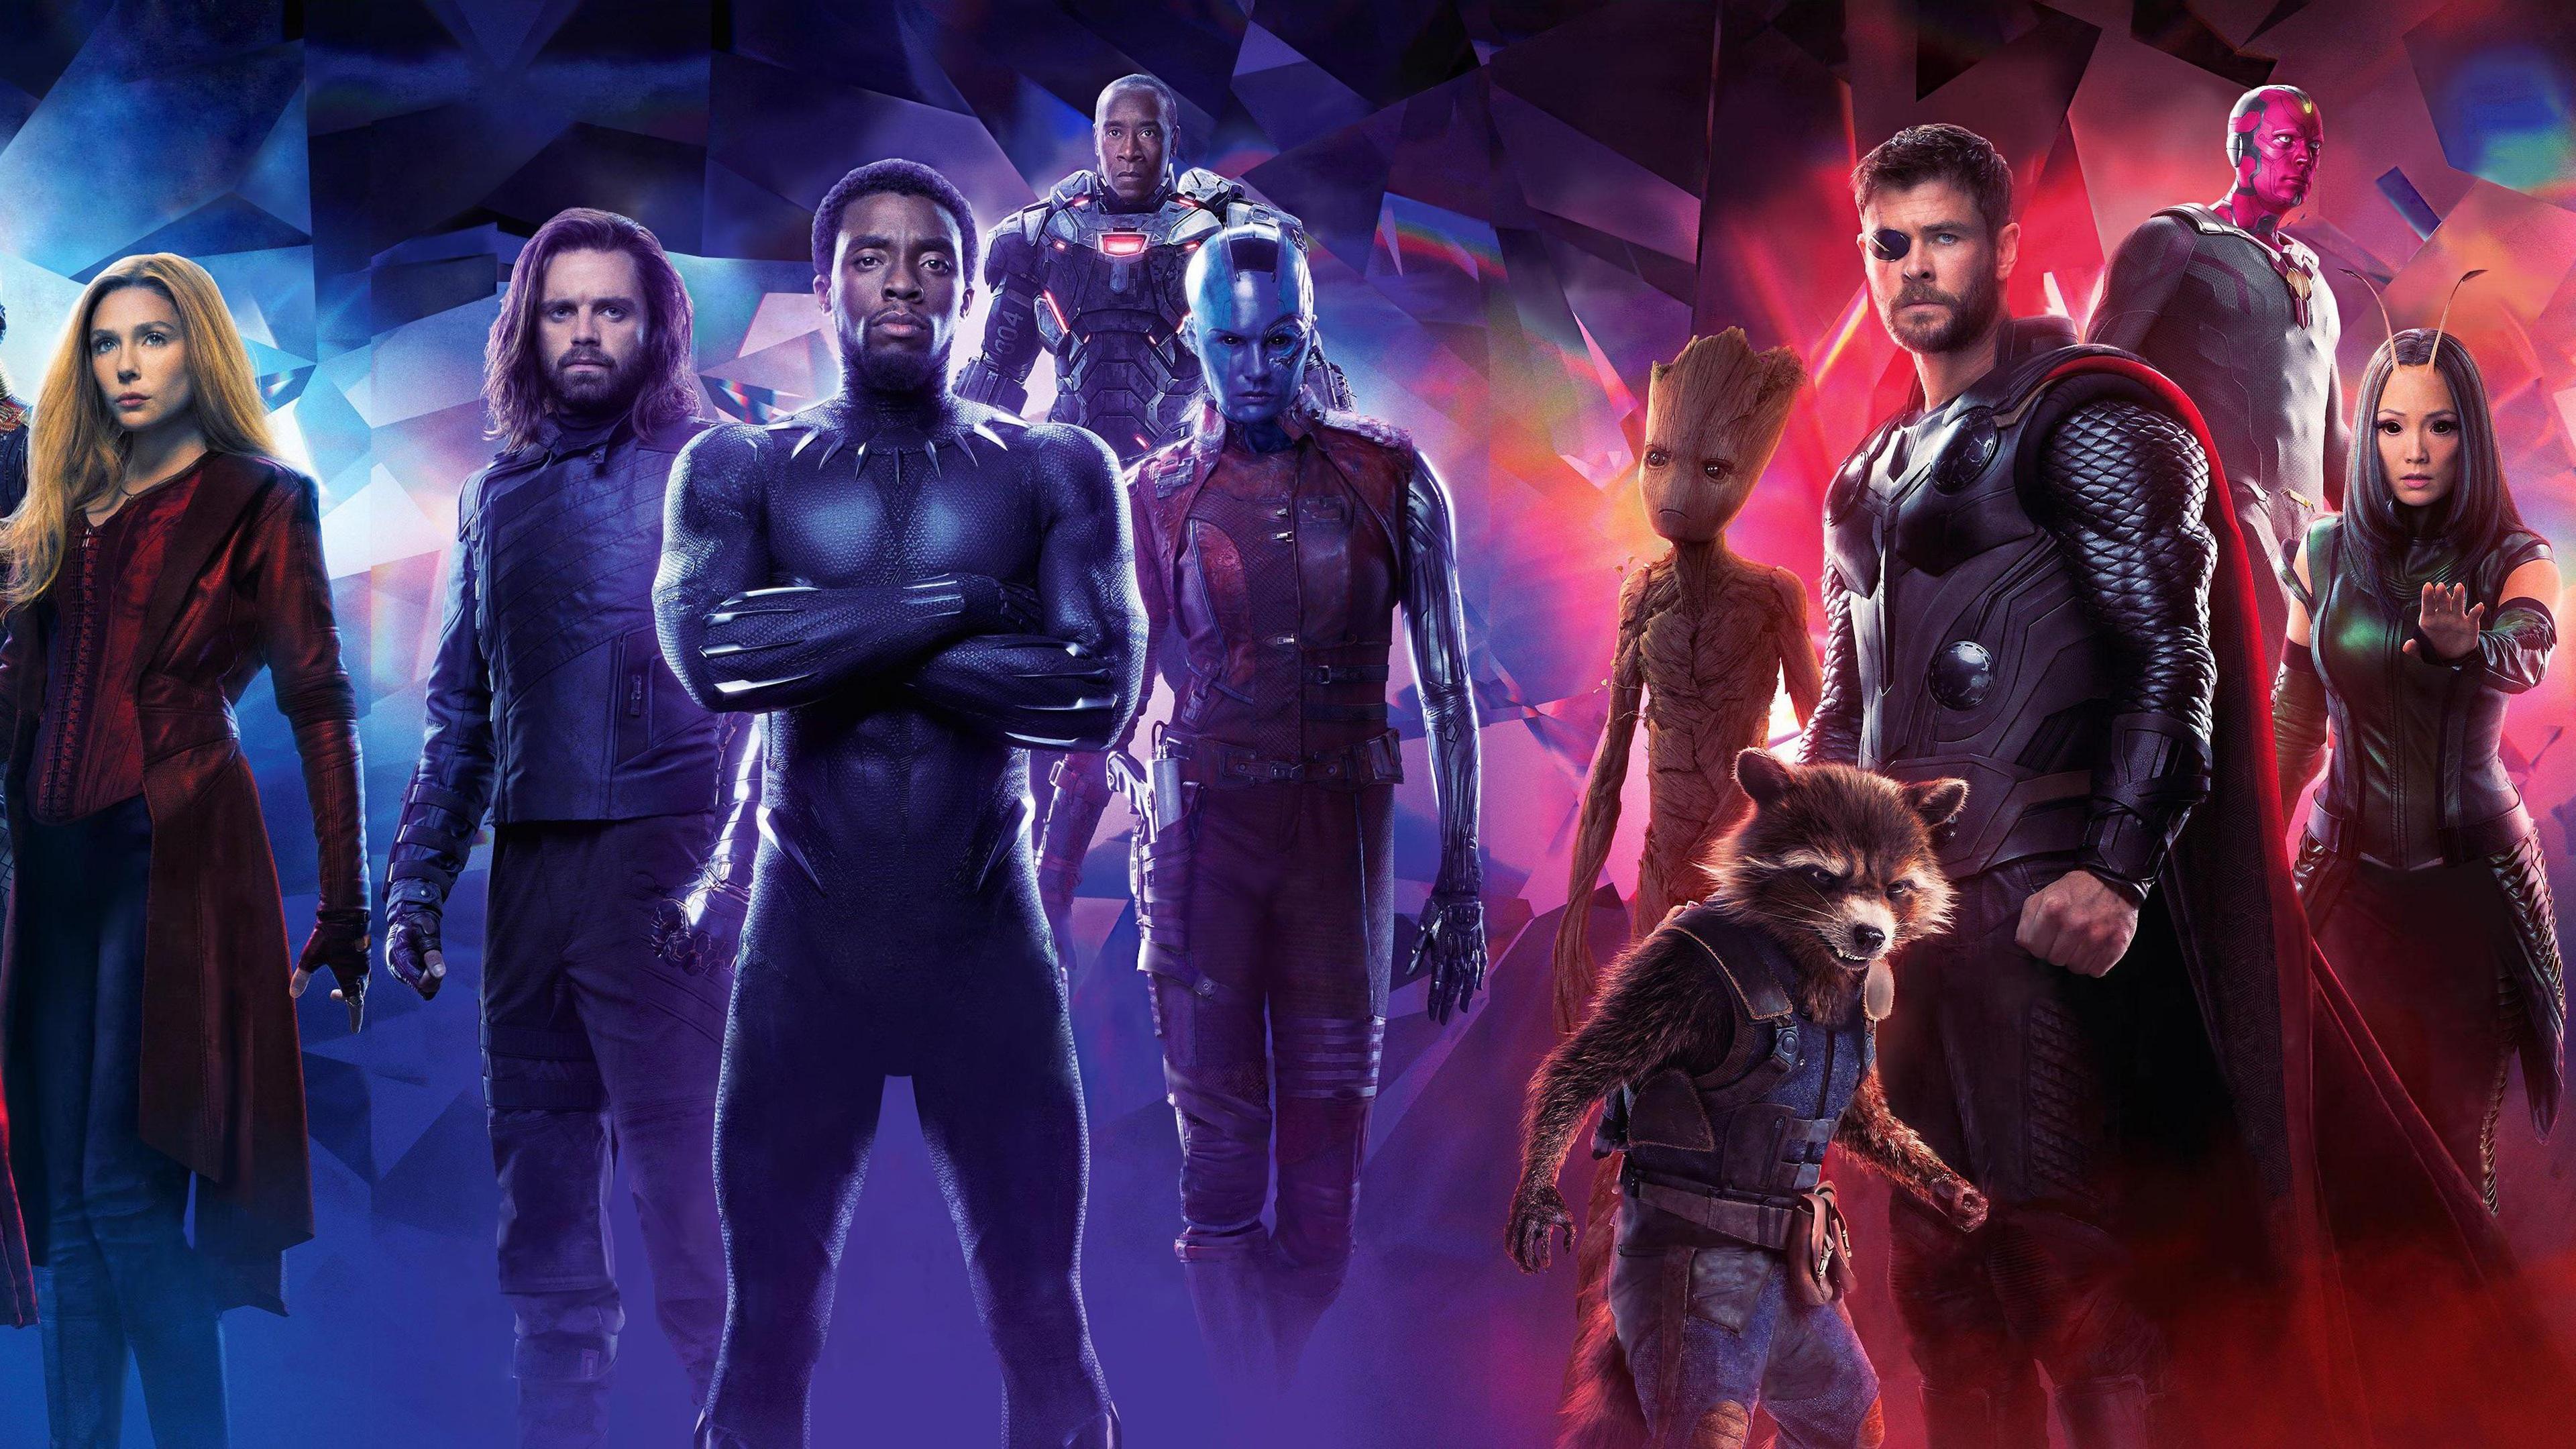 Fonds D écran Avengers Infinity War Les Super Héros